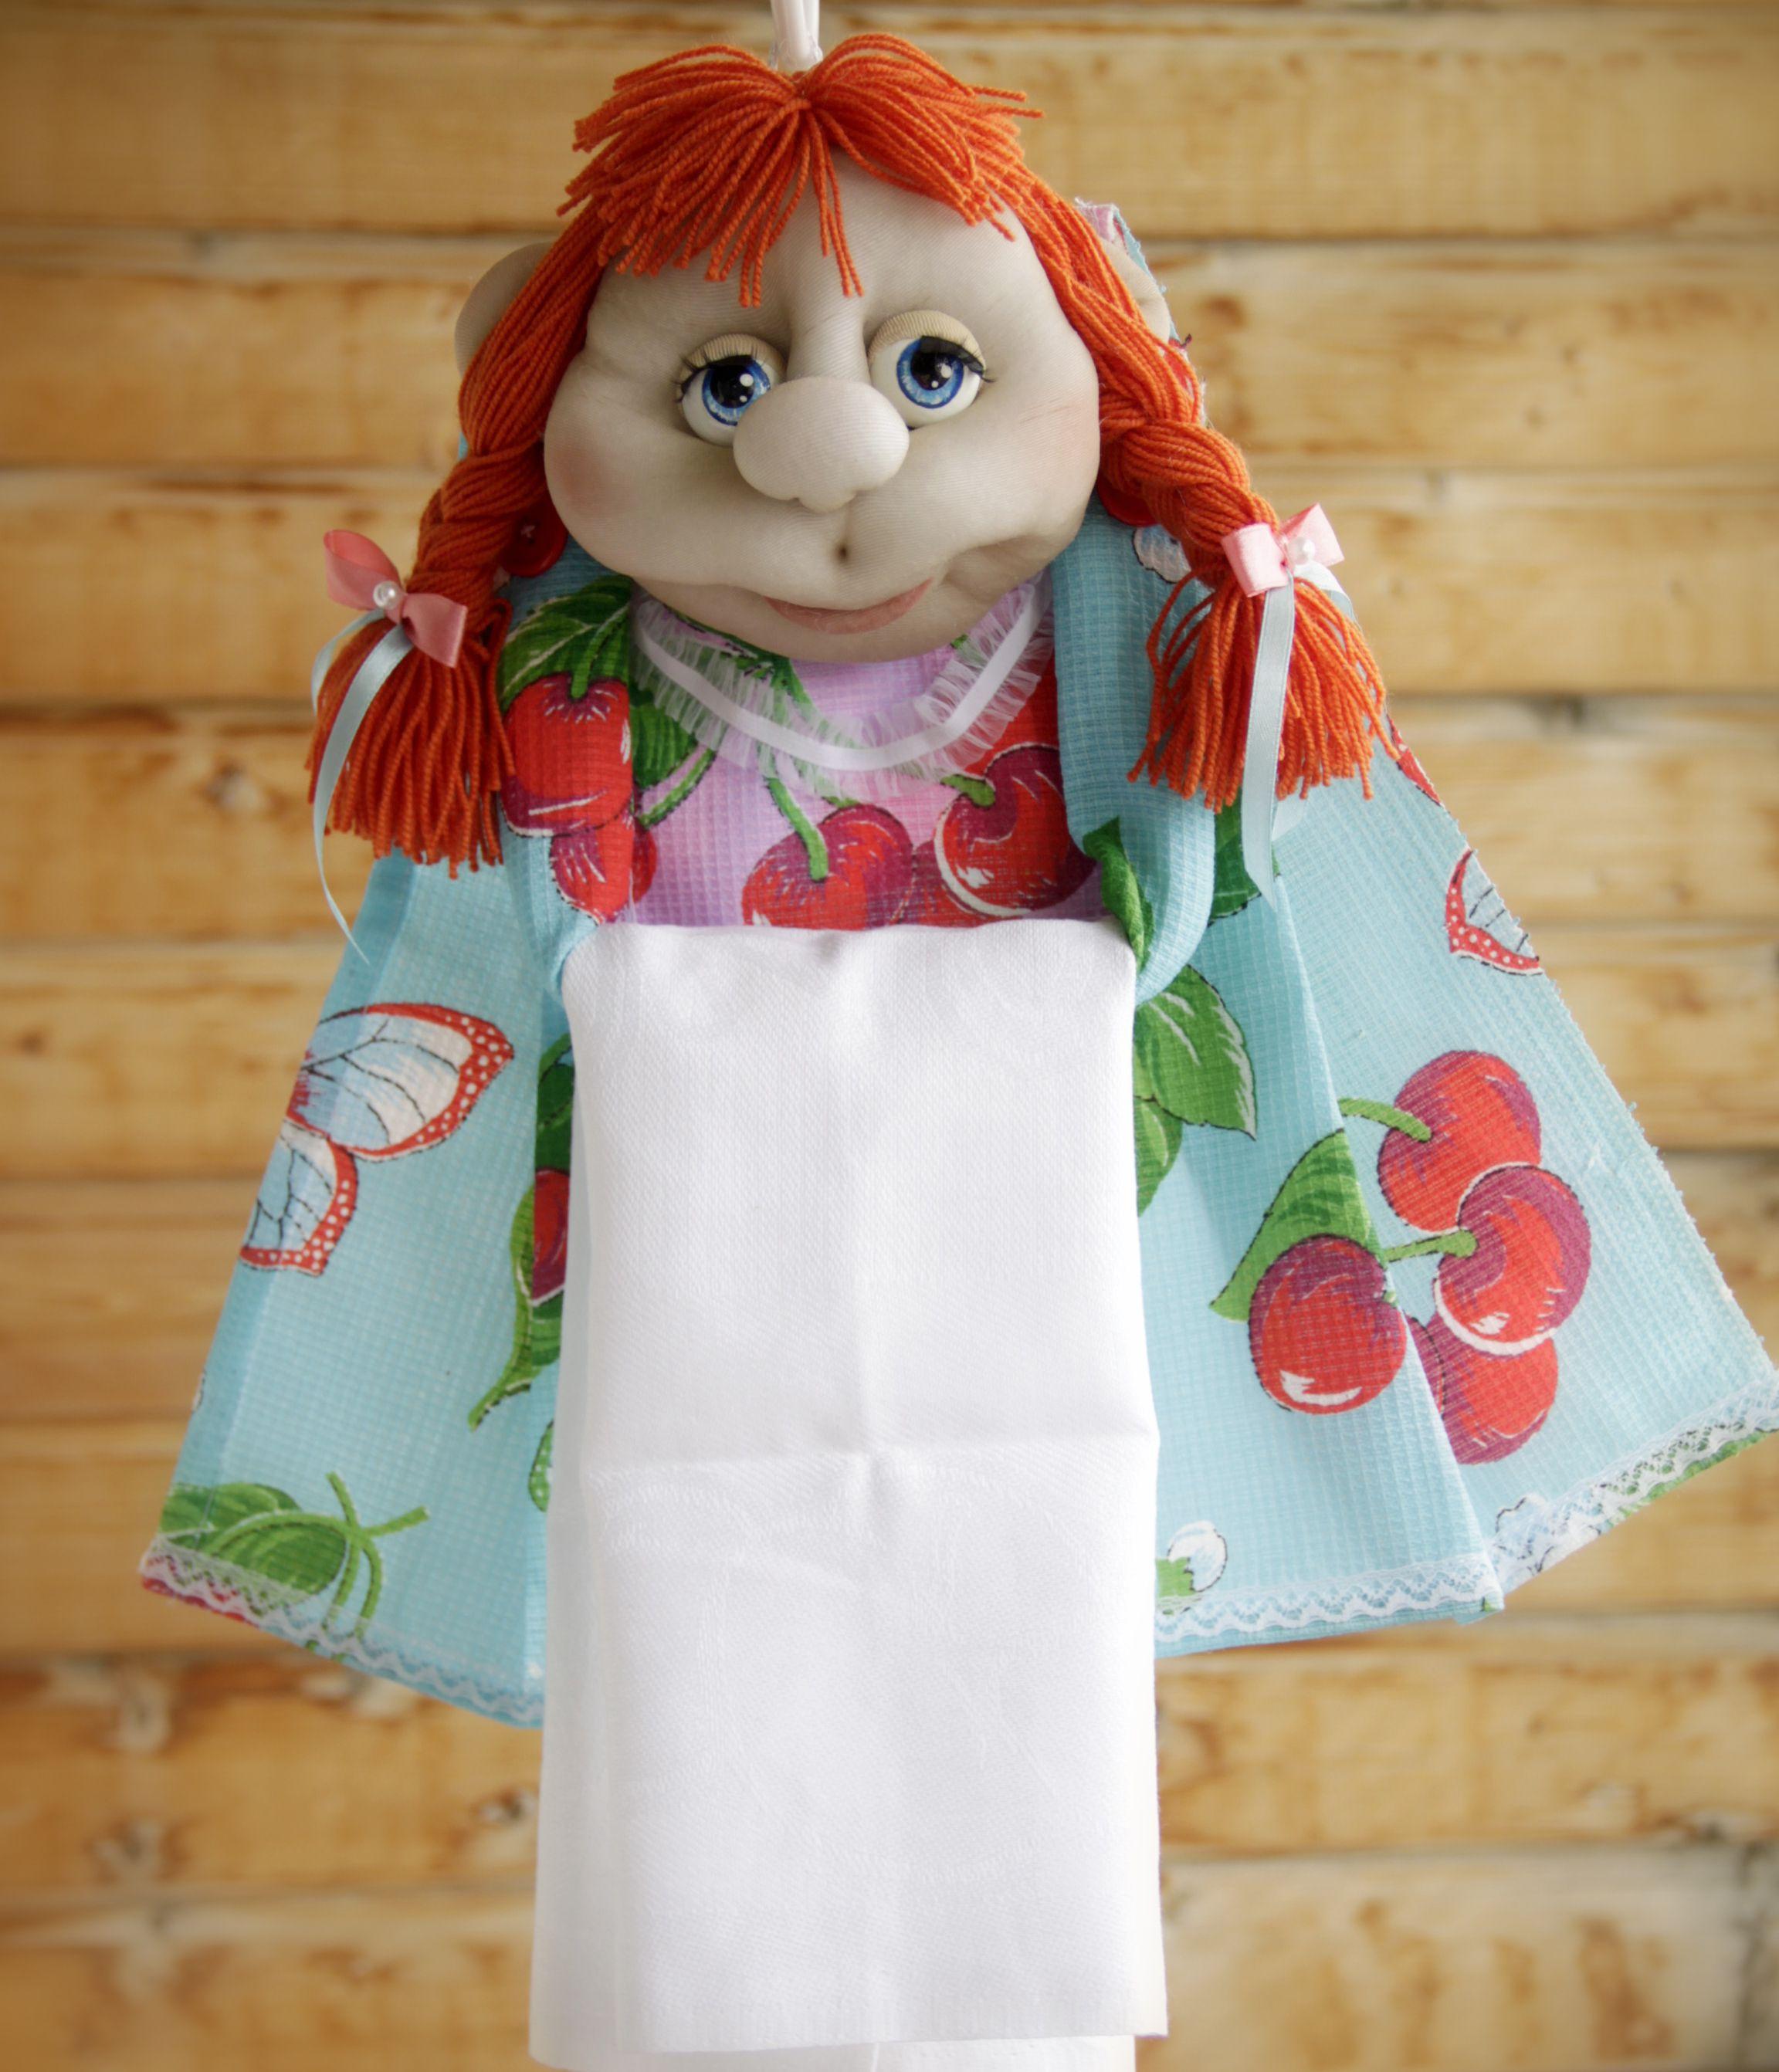 скульптурный капрона кукла ручная текстиль кухня из работа